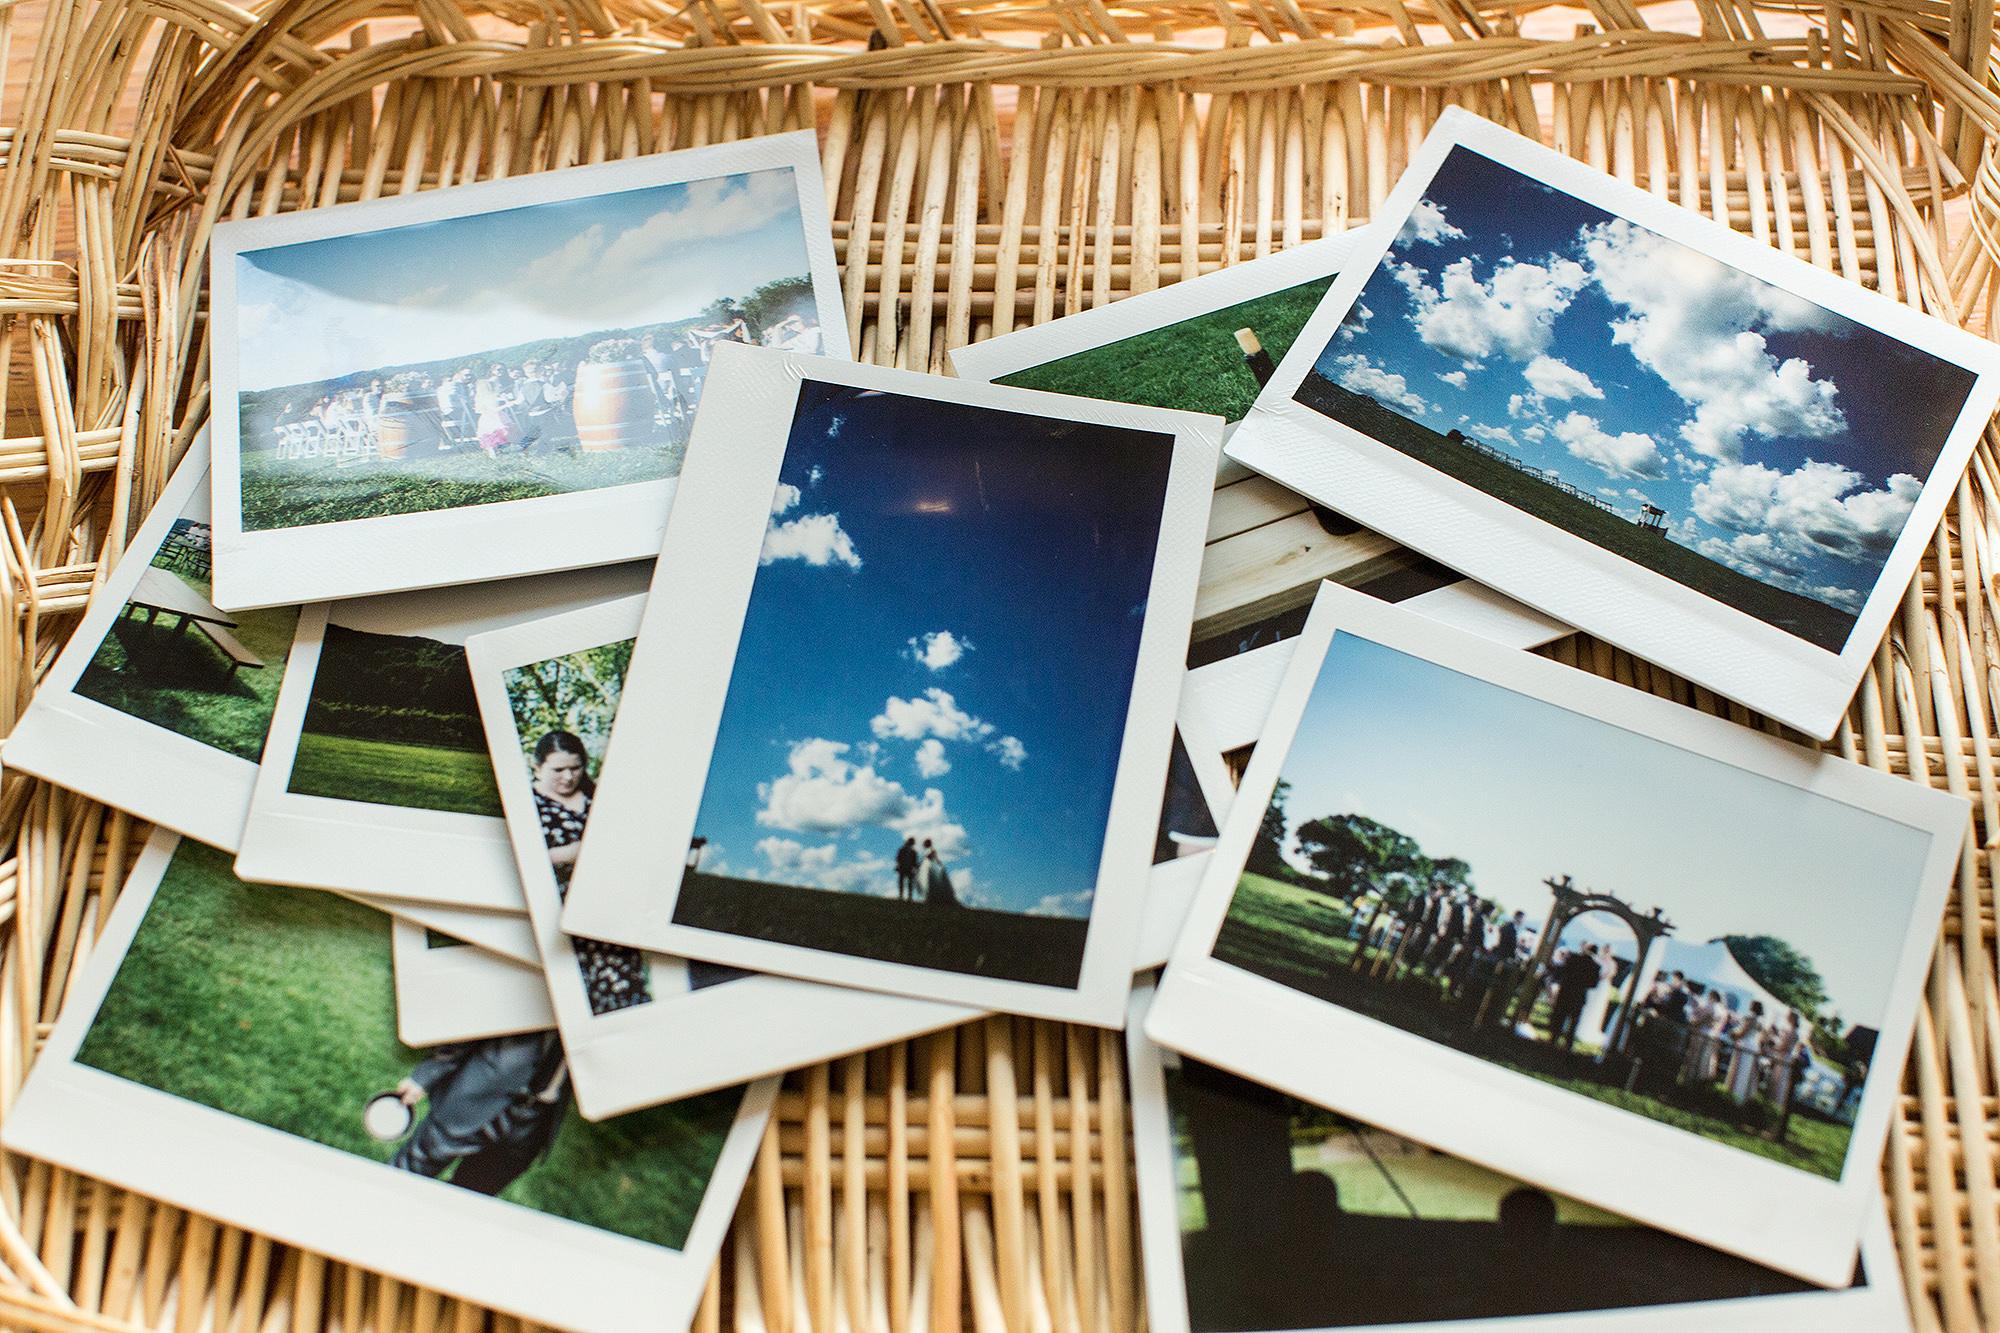 10-sarah-corbett-photography-polaroids.jpg